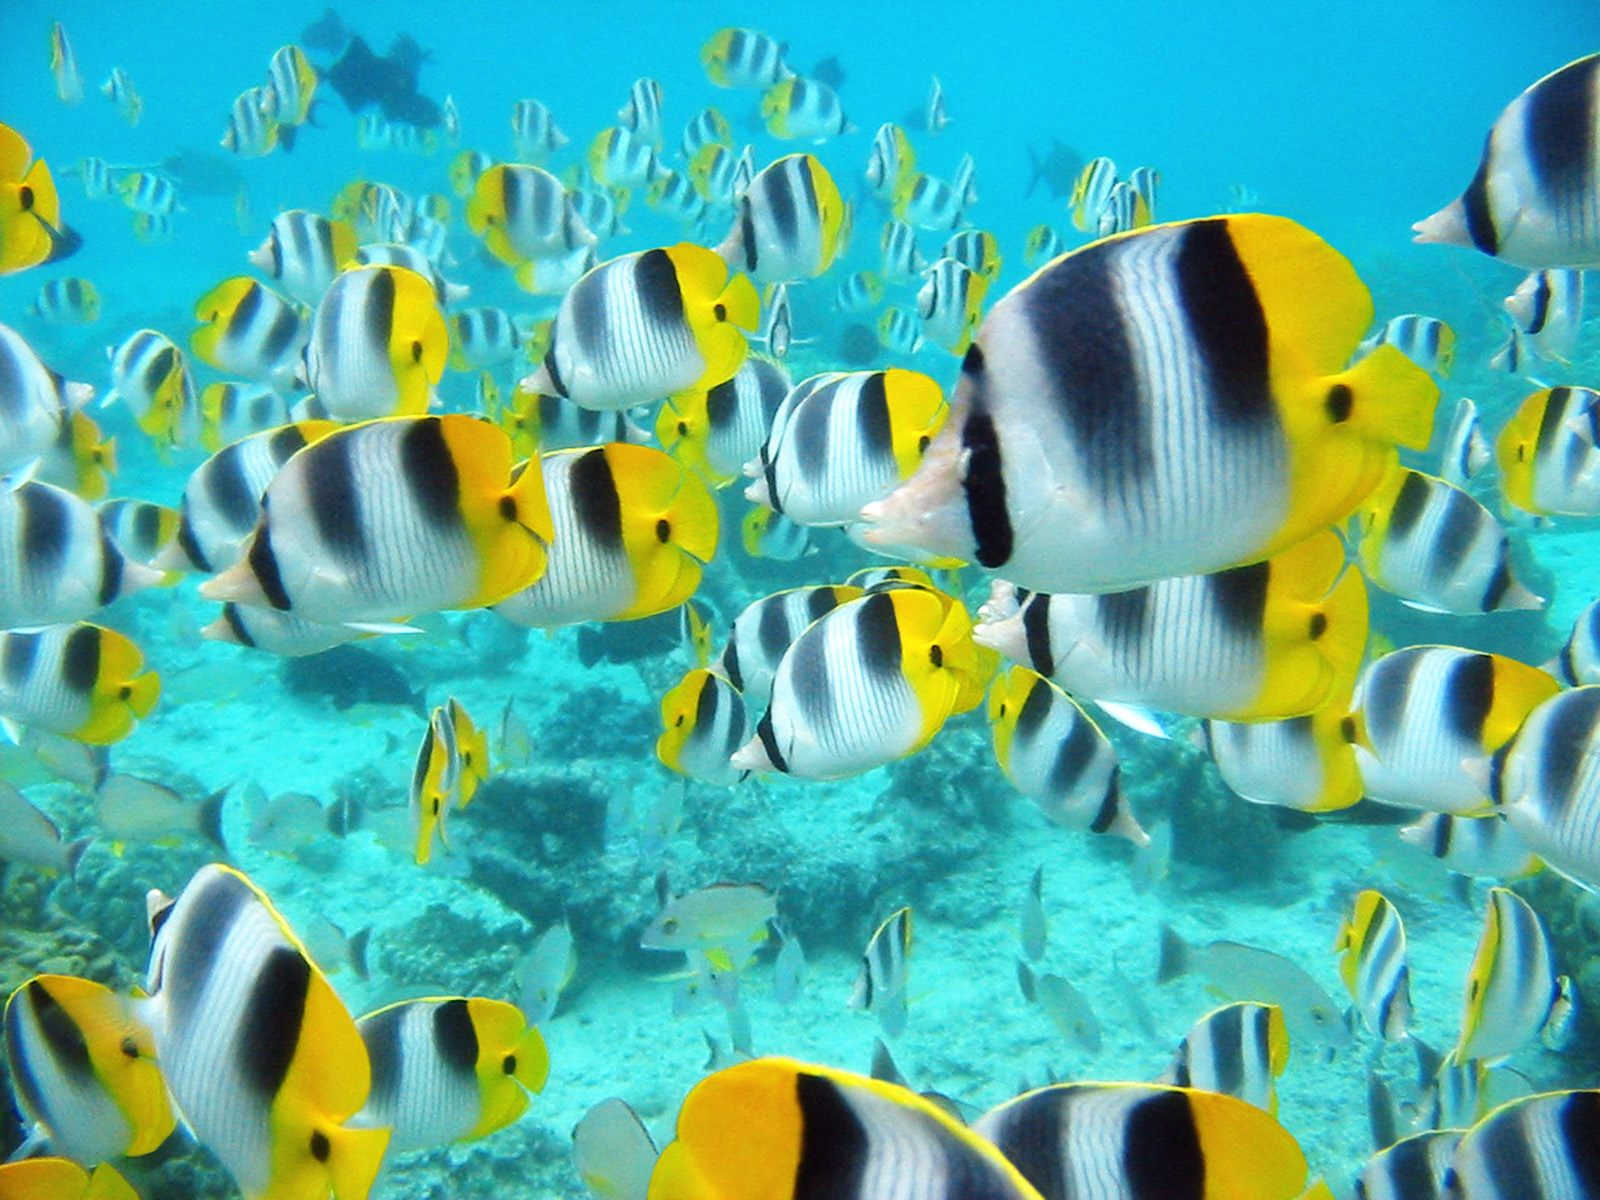 tropical fish screensaver tropical fish screensaver tropical fish pic